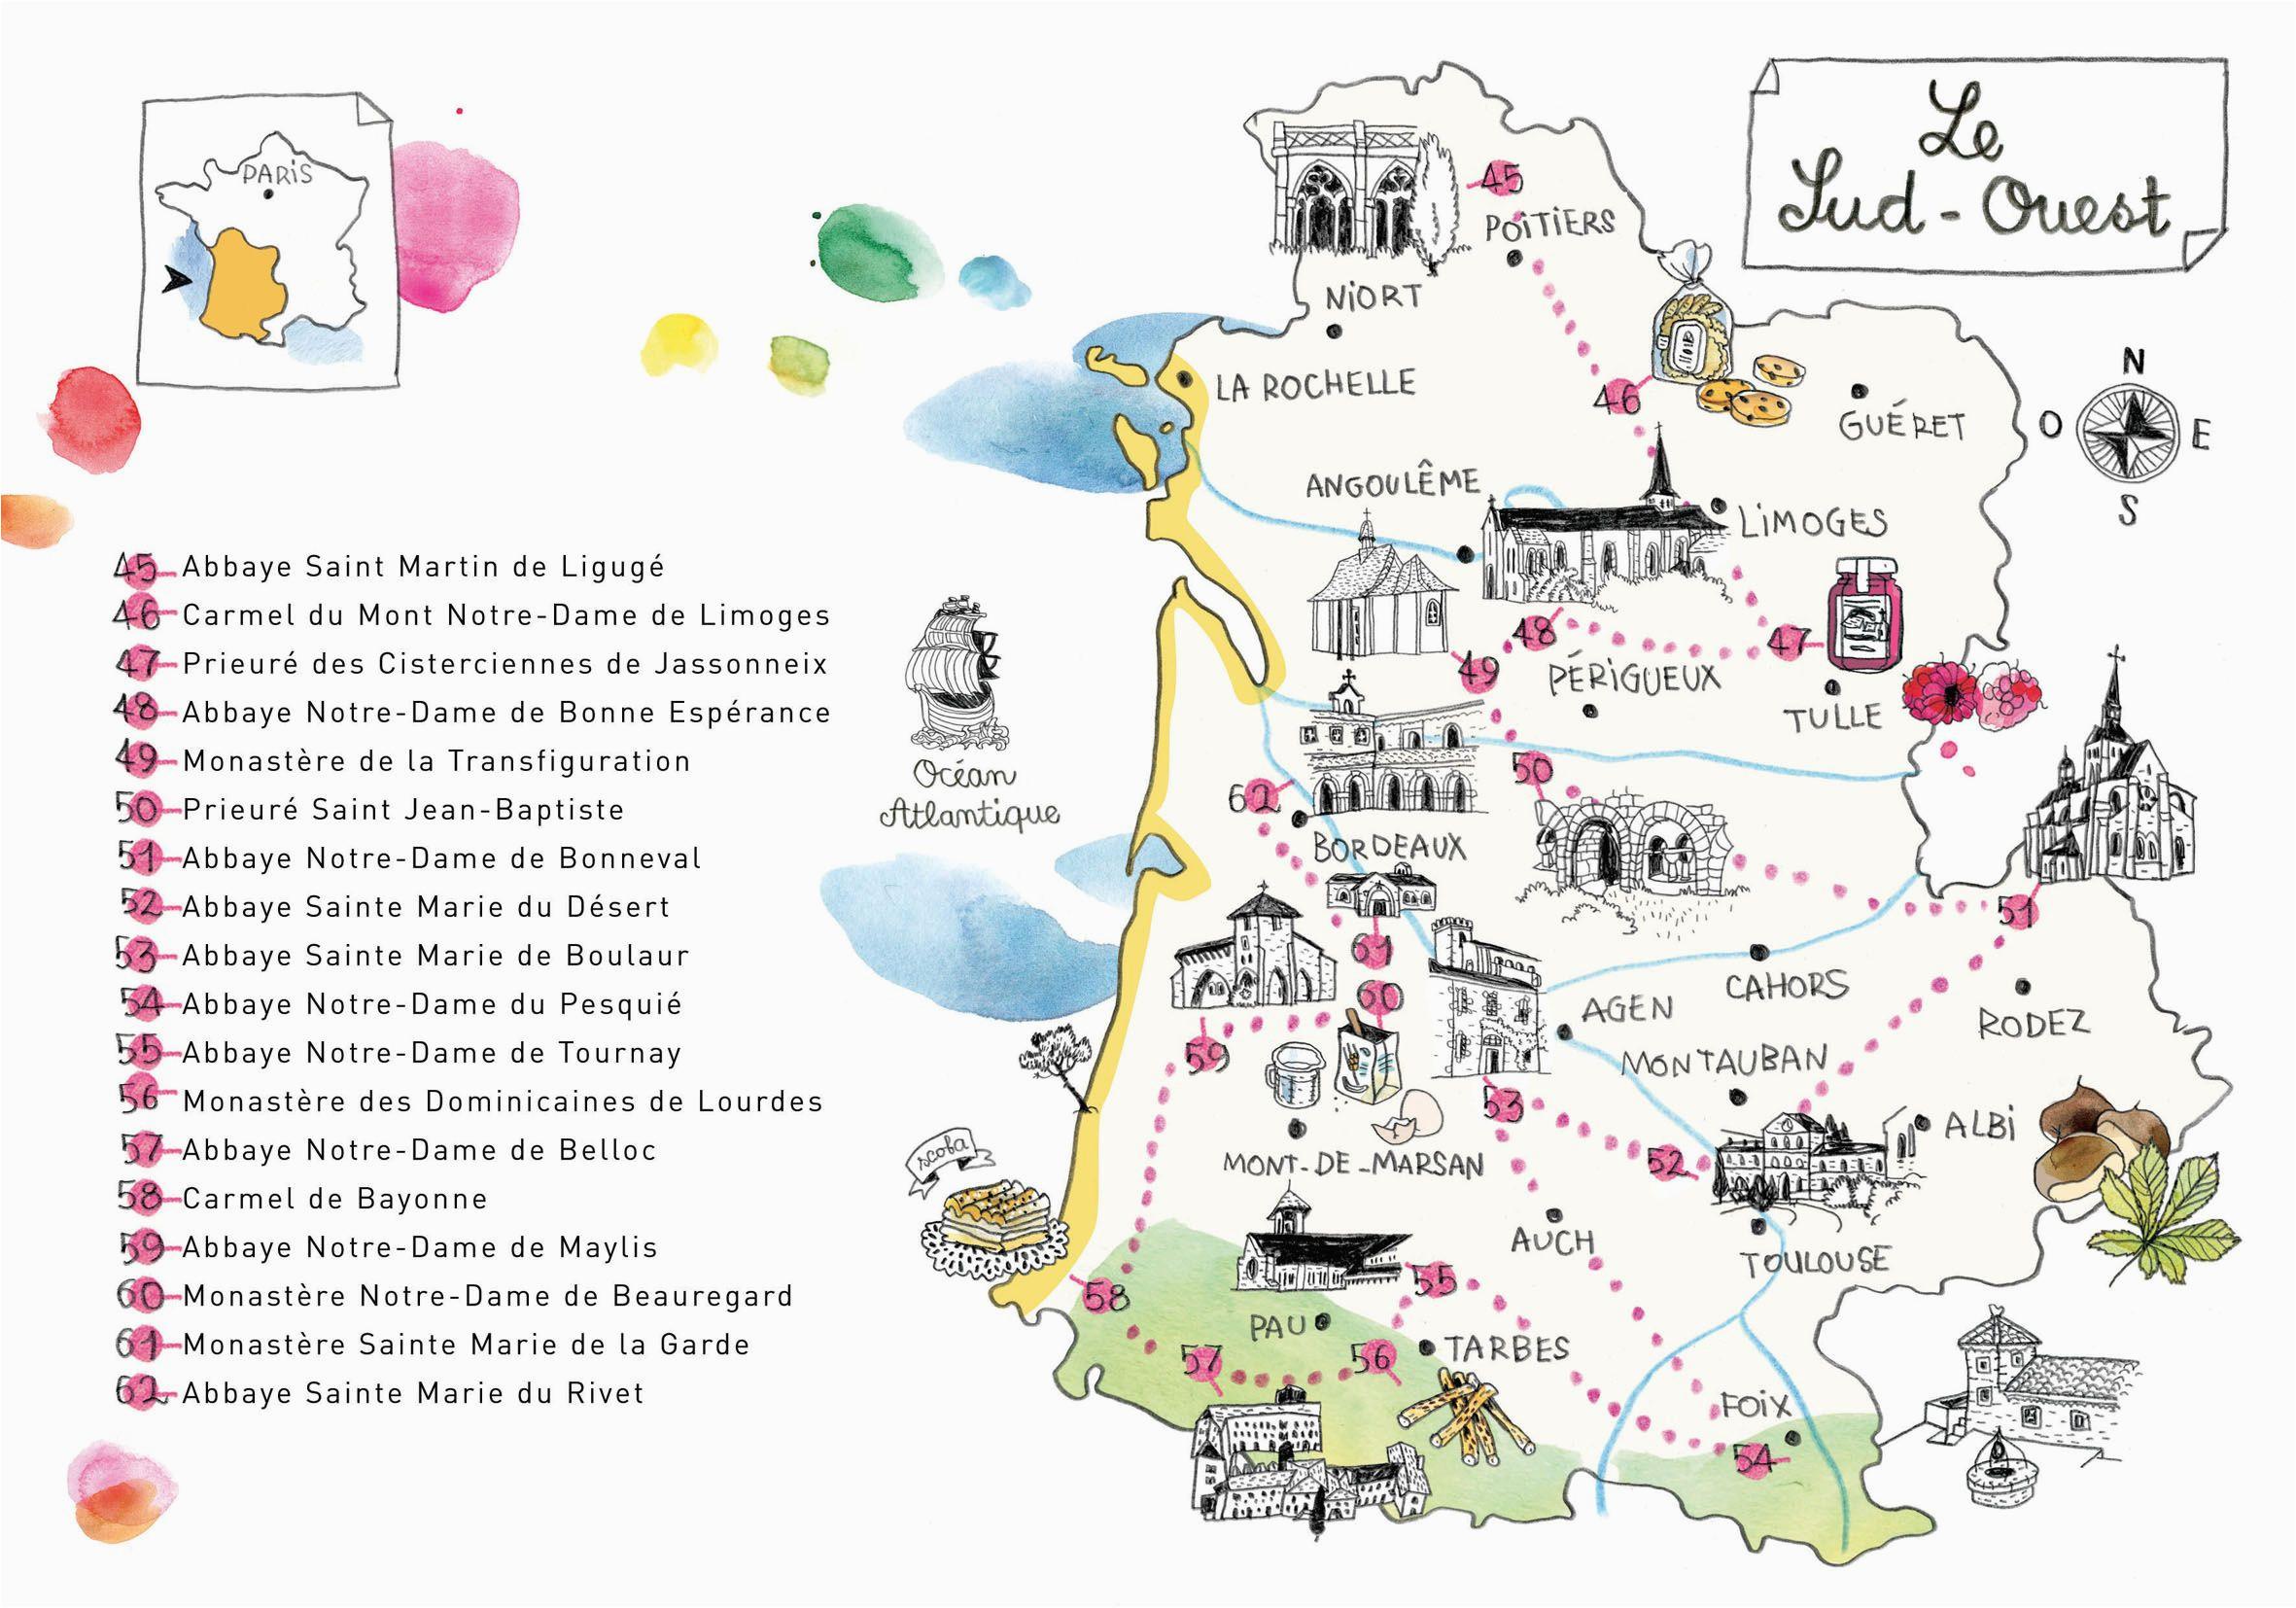 caroline donadieu guide des abbayes south west france map map